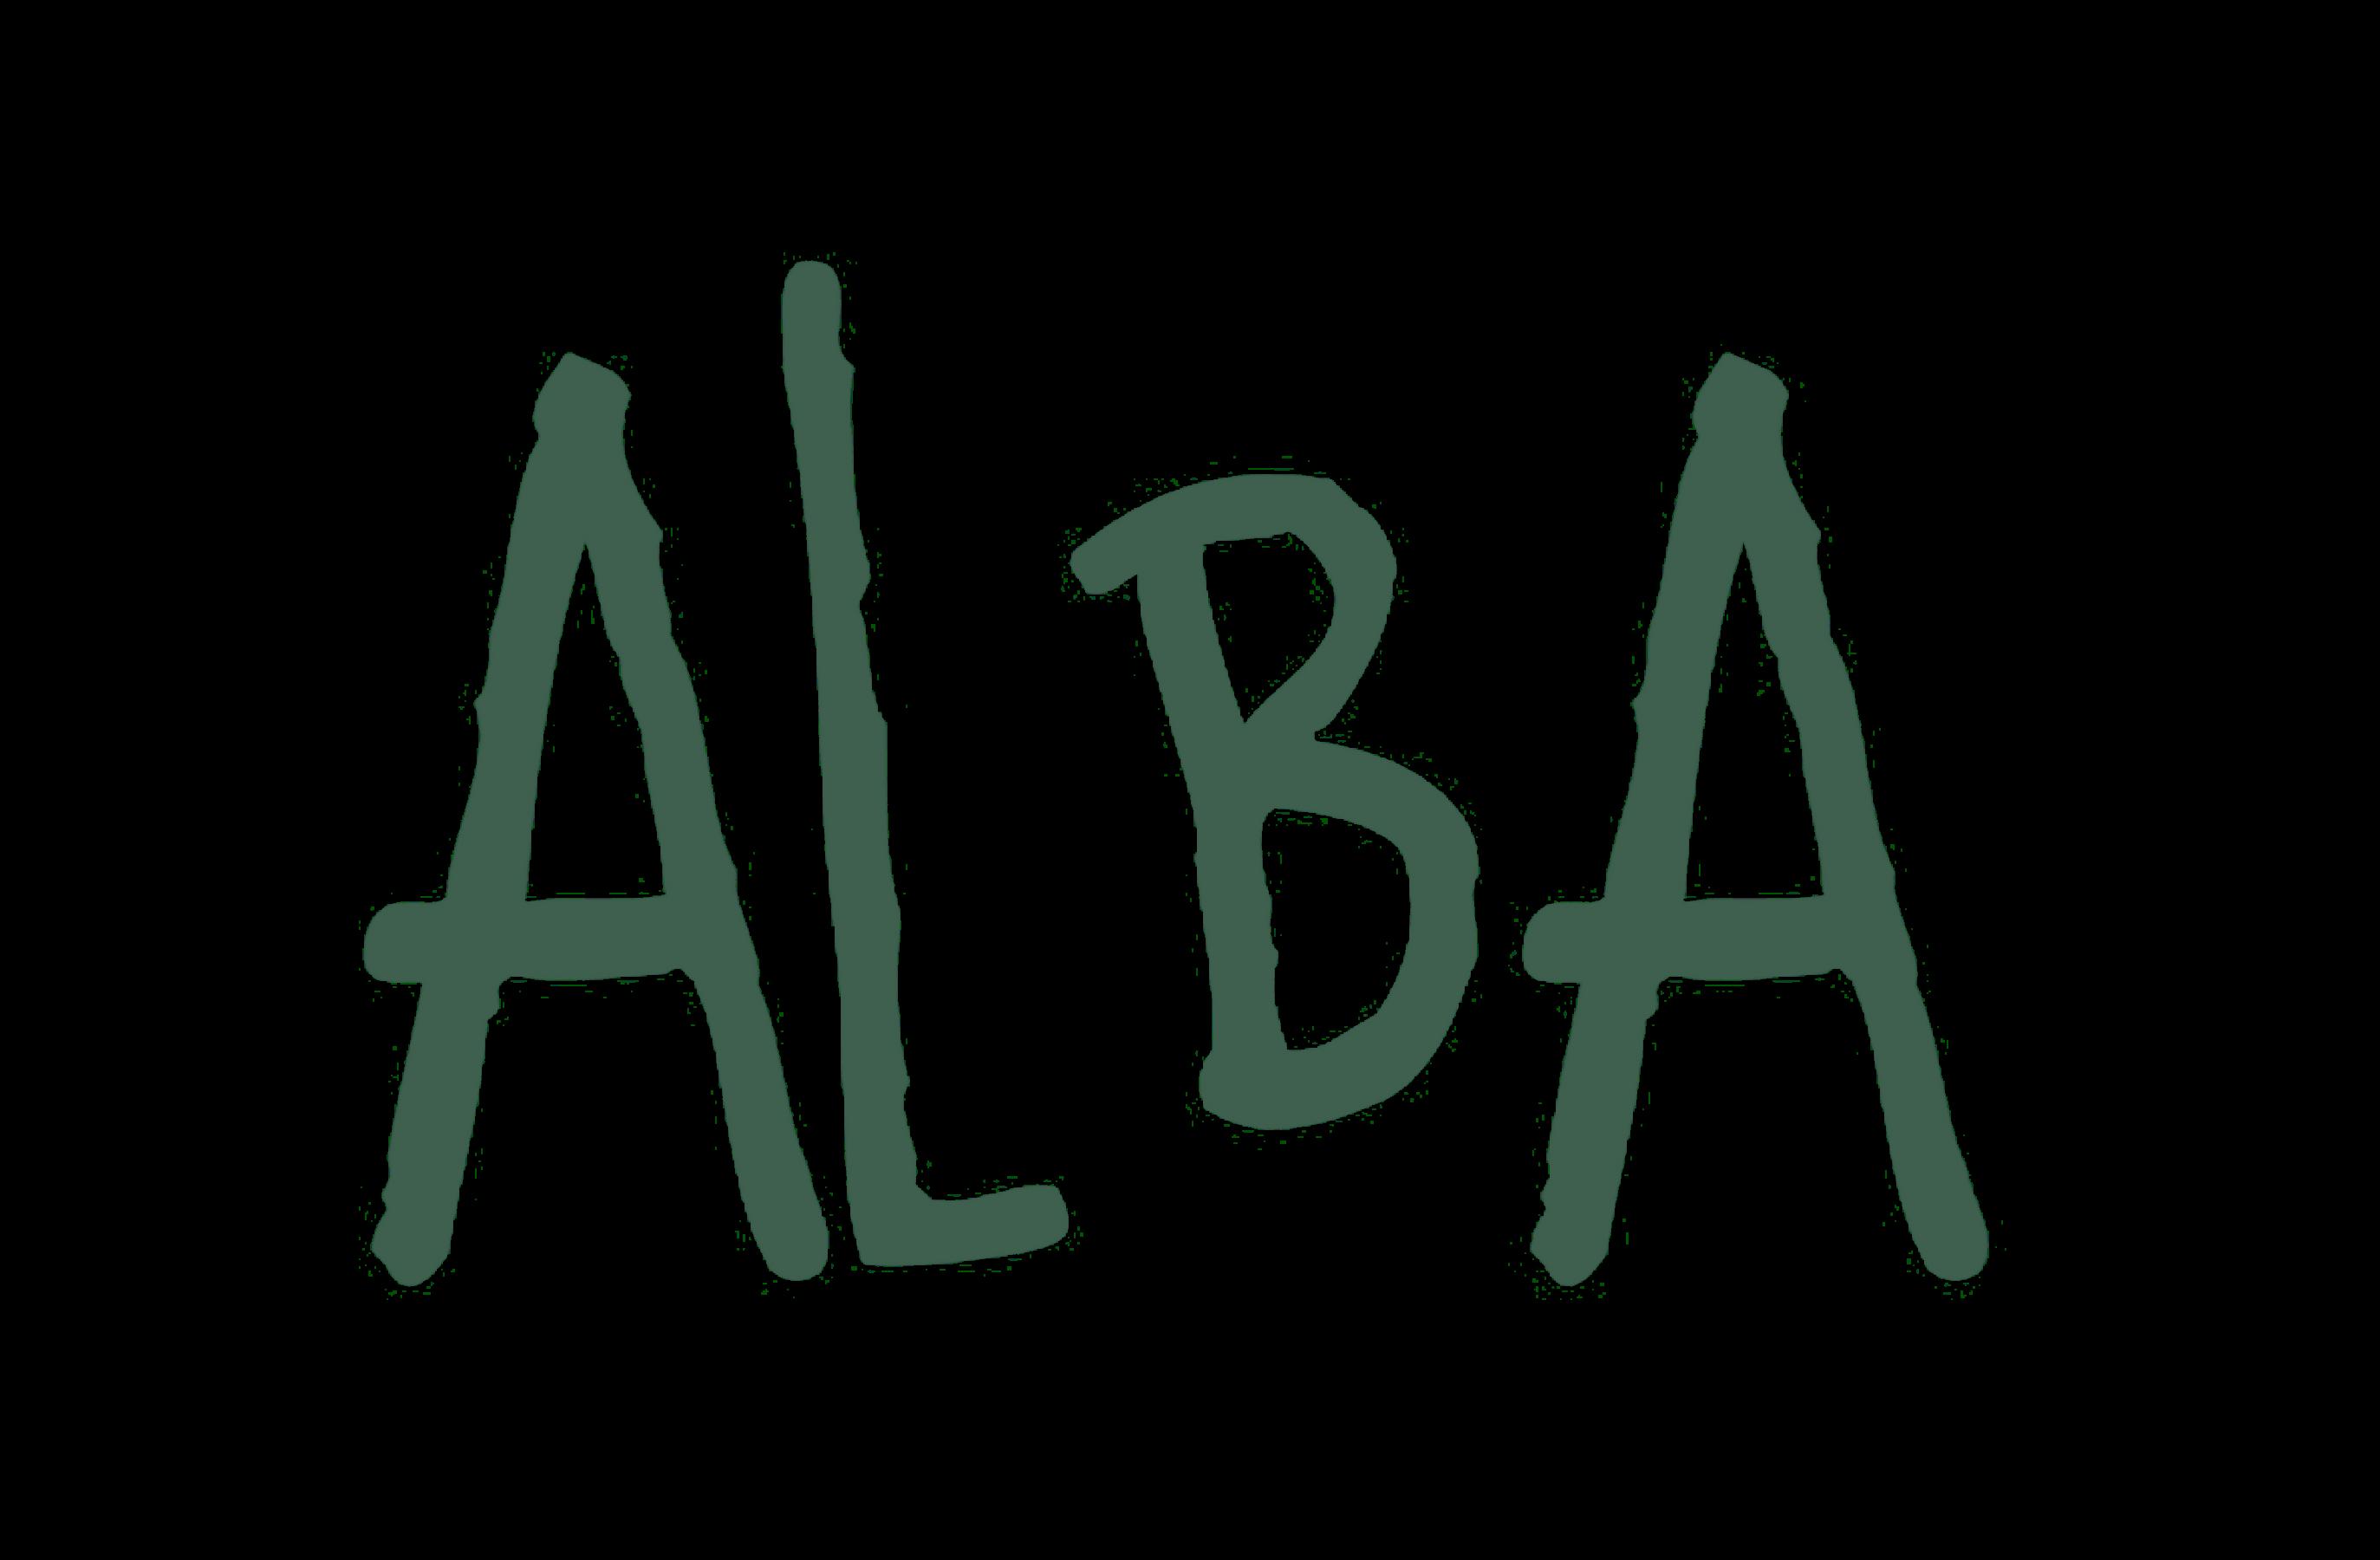 Alba logo